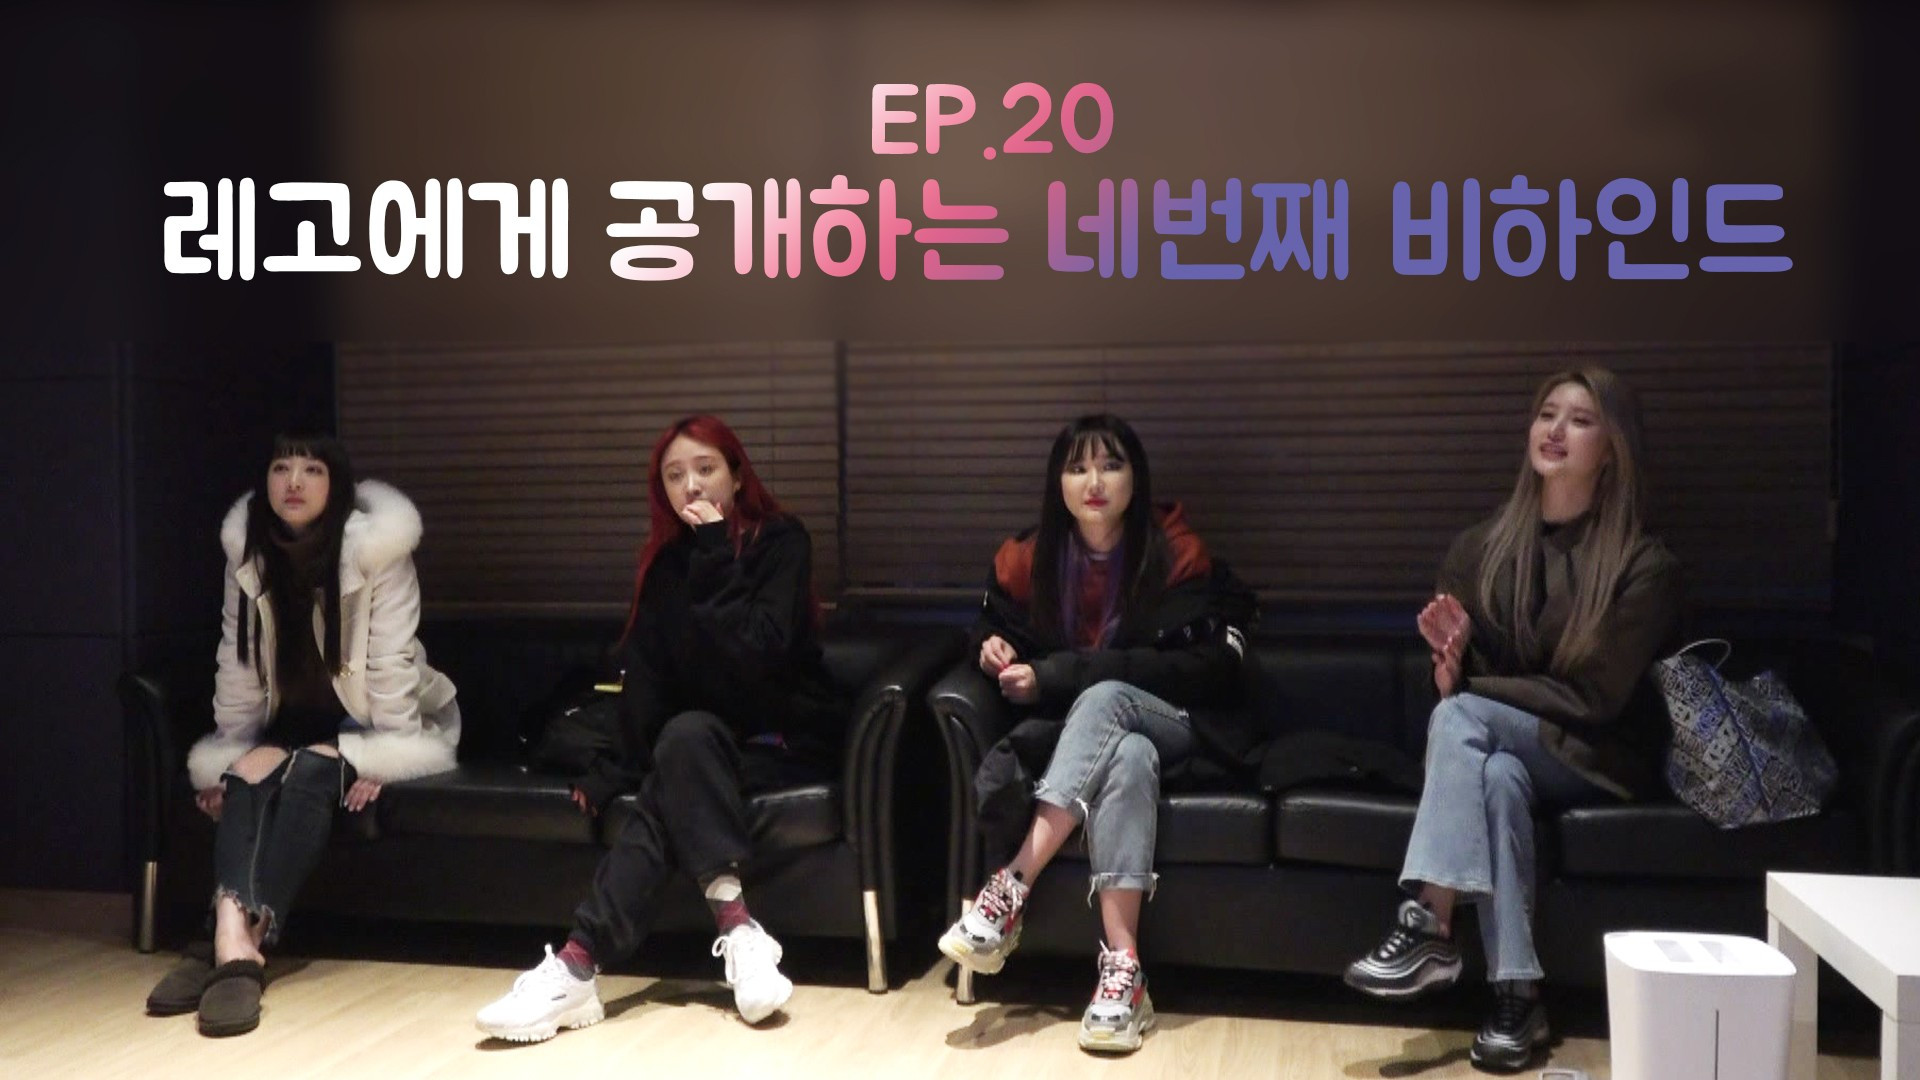 [MADE IN EXID] EXID EP20. 레고에게 공개하는 네번째 비하인드